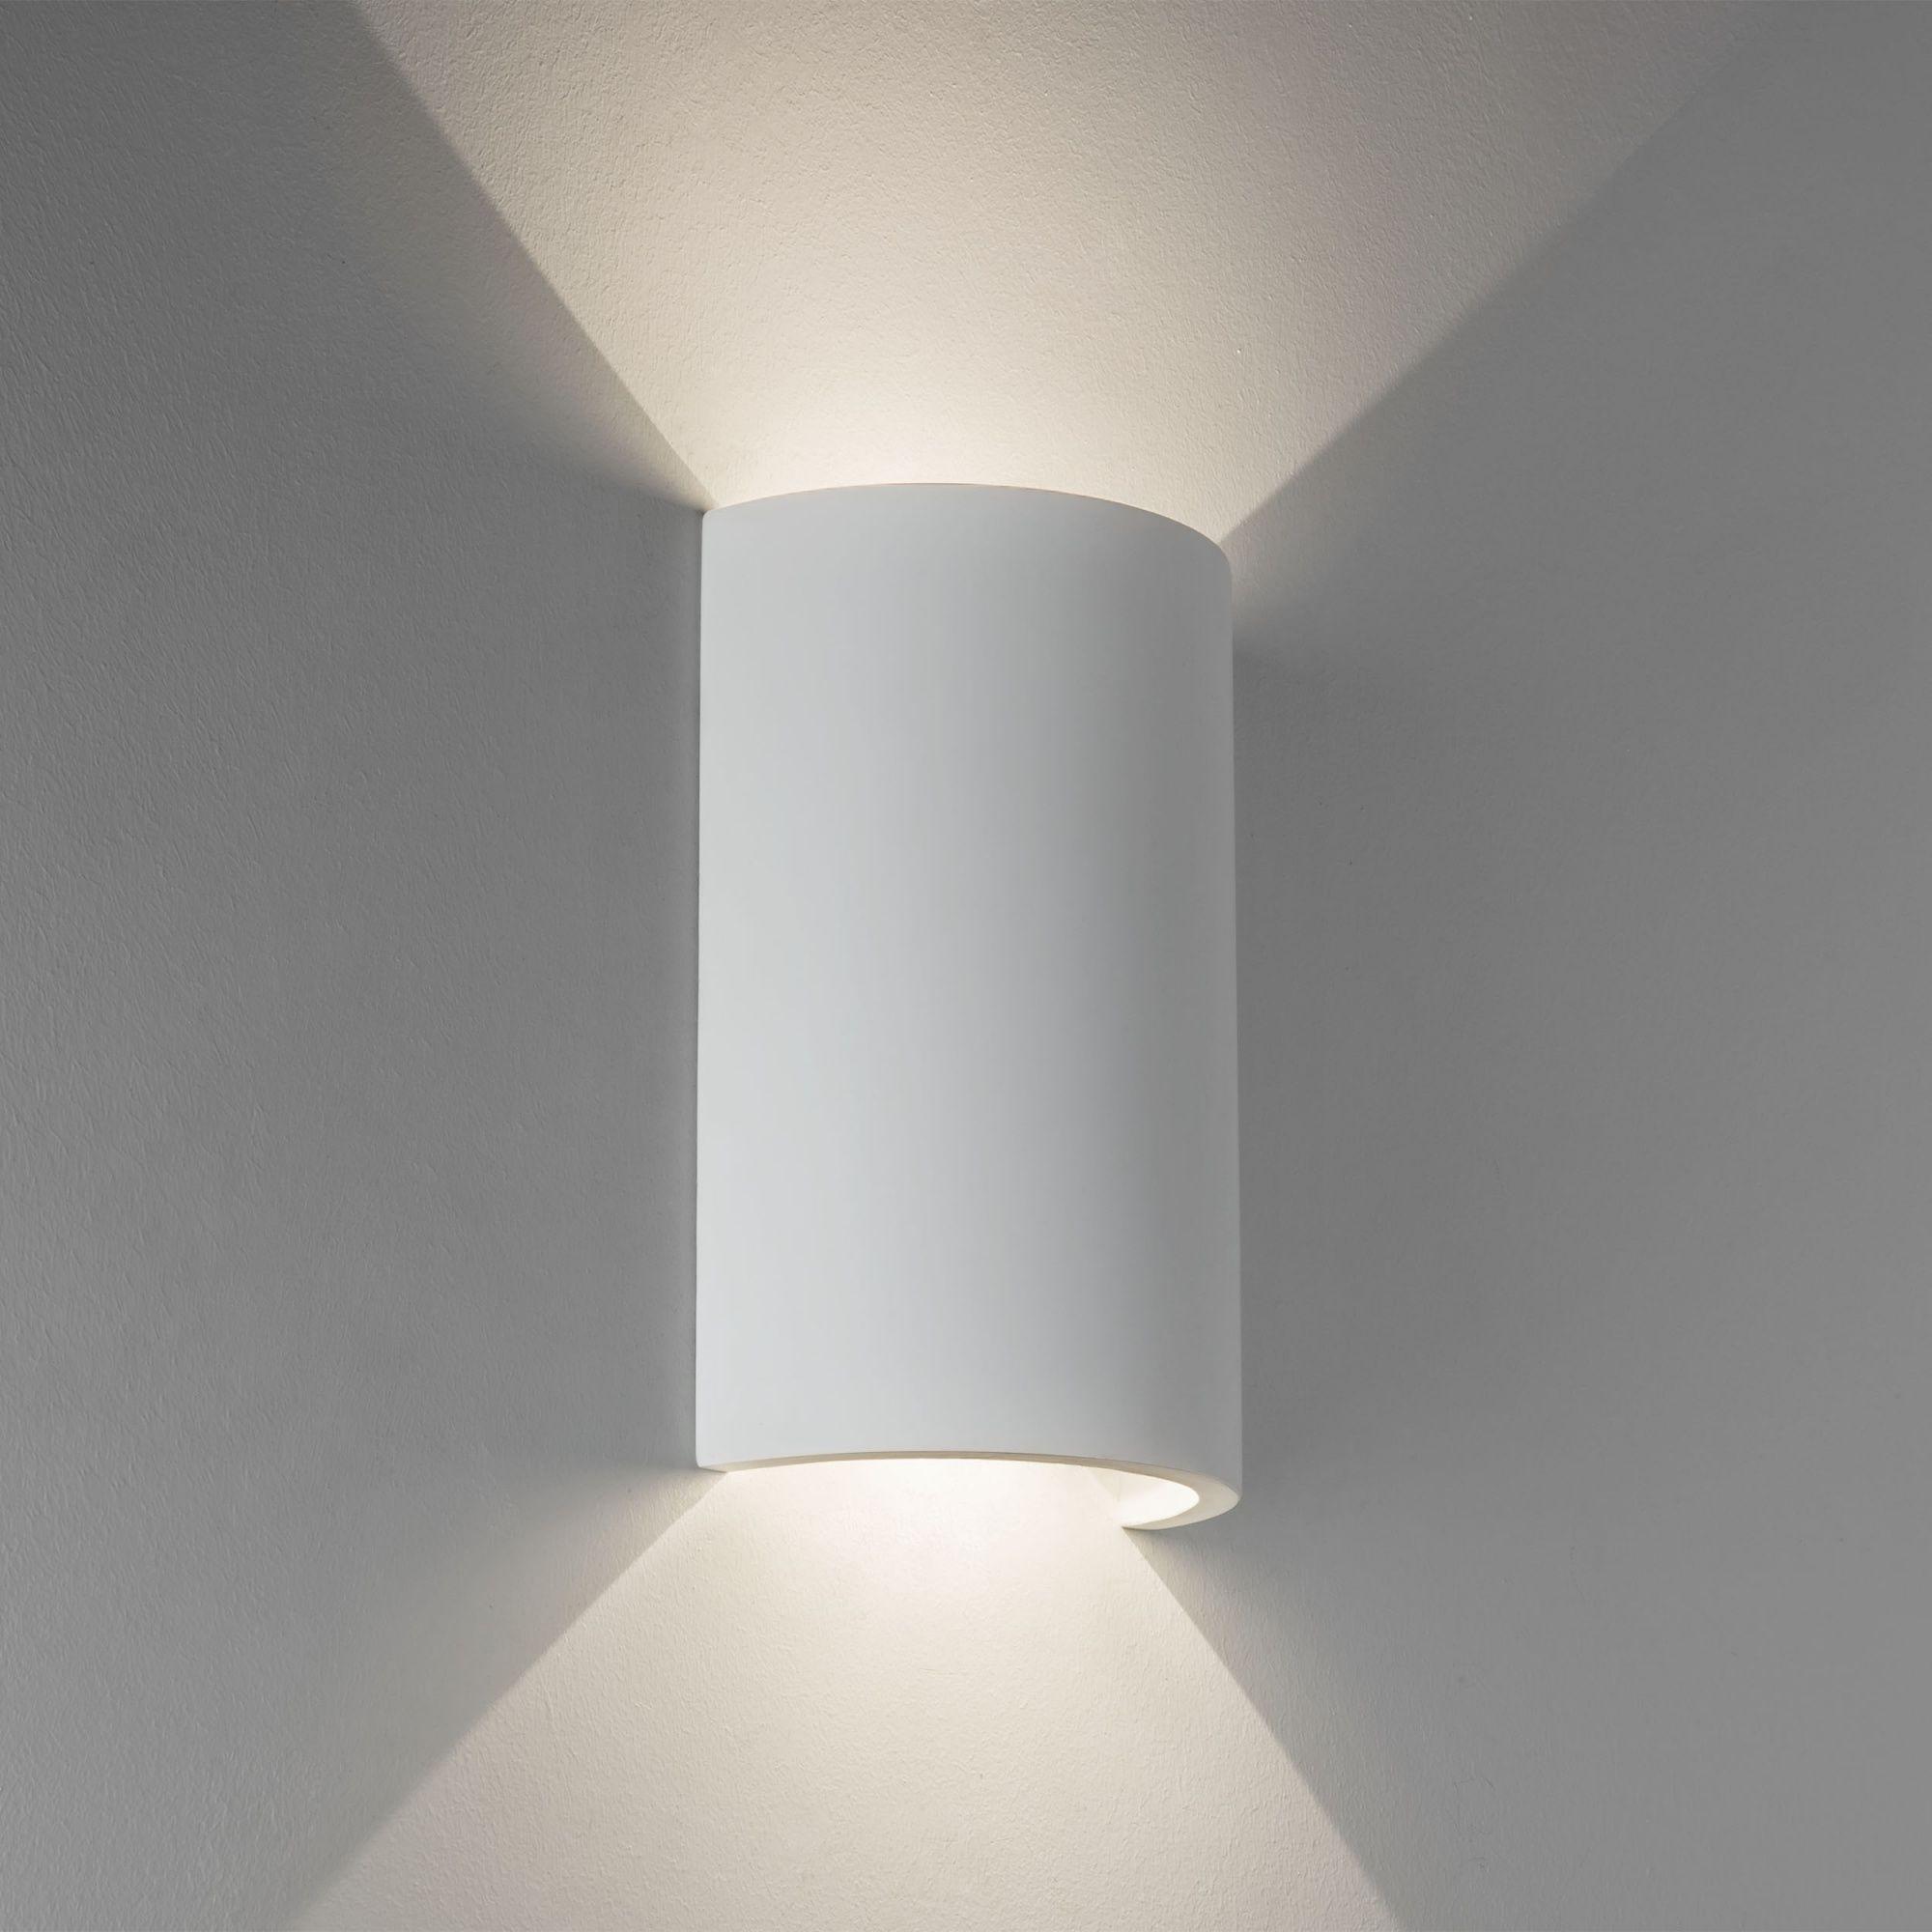 Kinkiet Serifos 170 7375 Astro Lighting